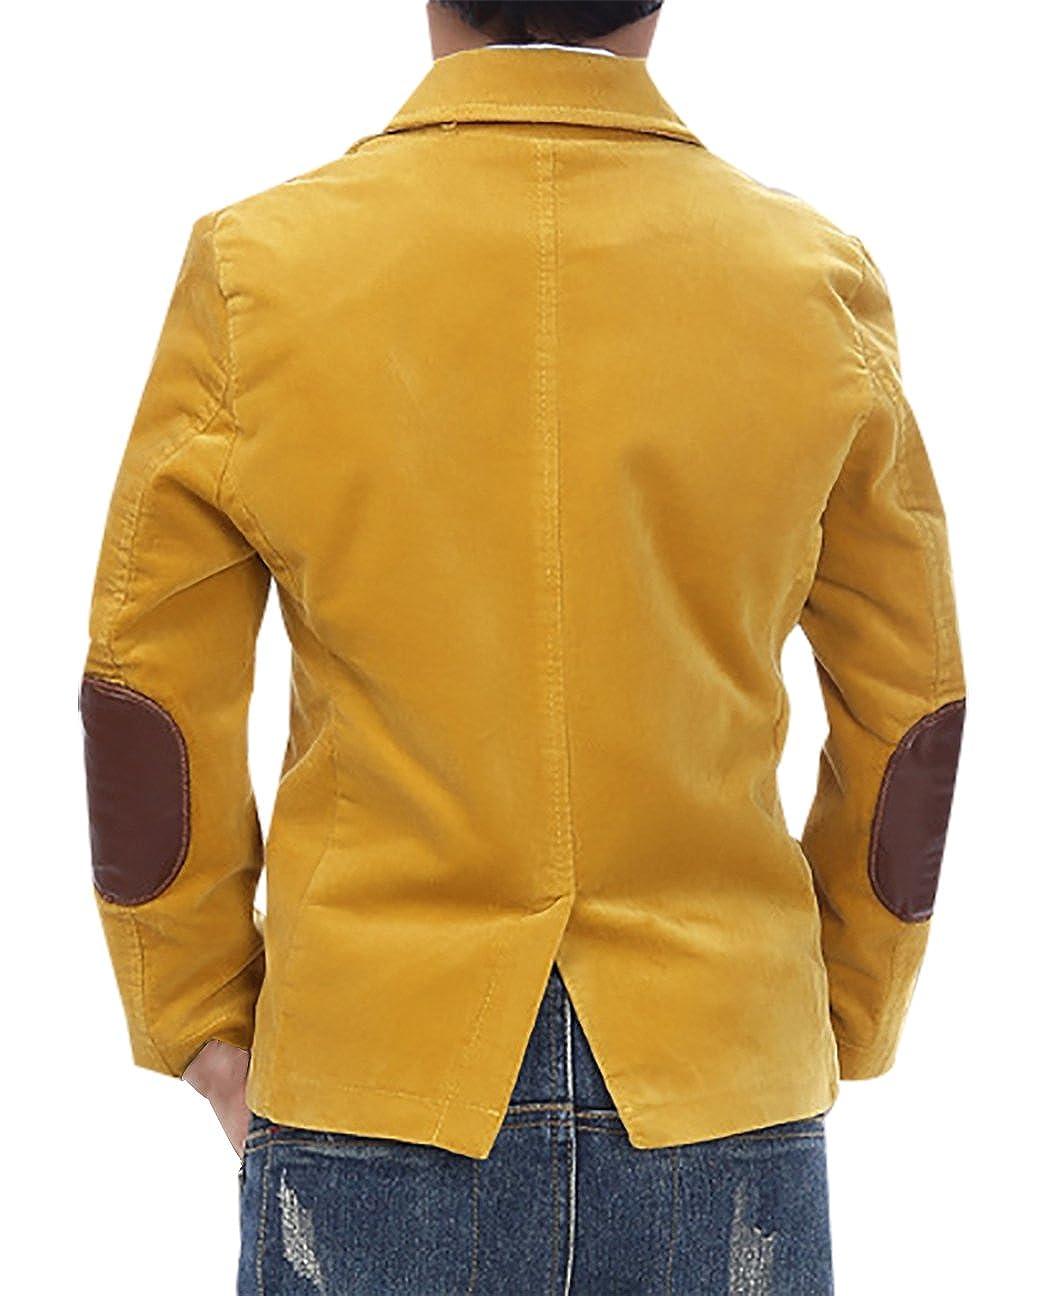 Amazon.com: JiaYou - Chaqueta para niño con botones: Clothing